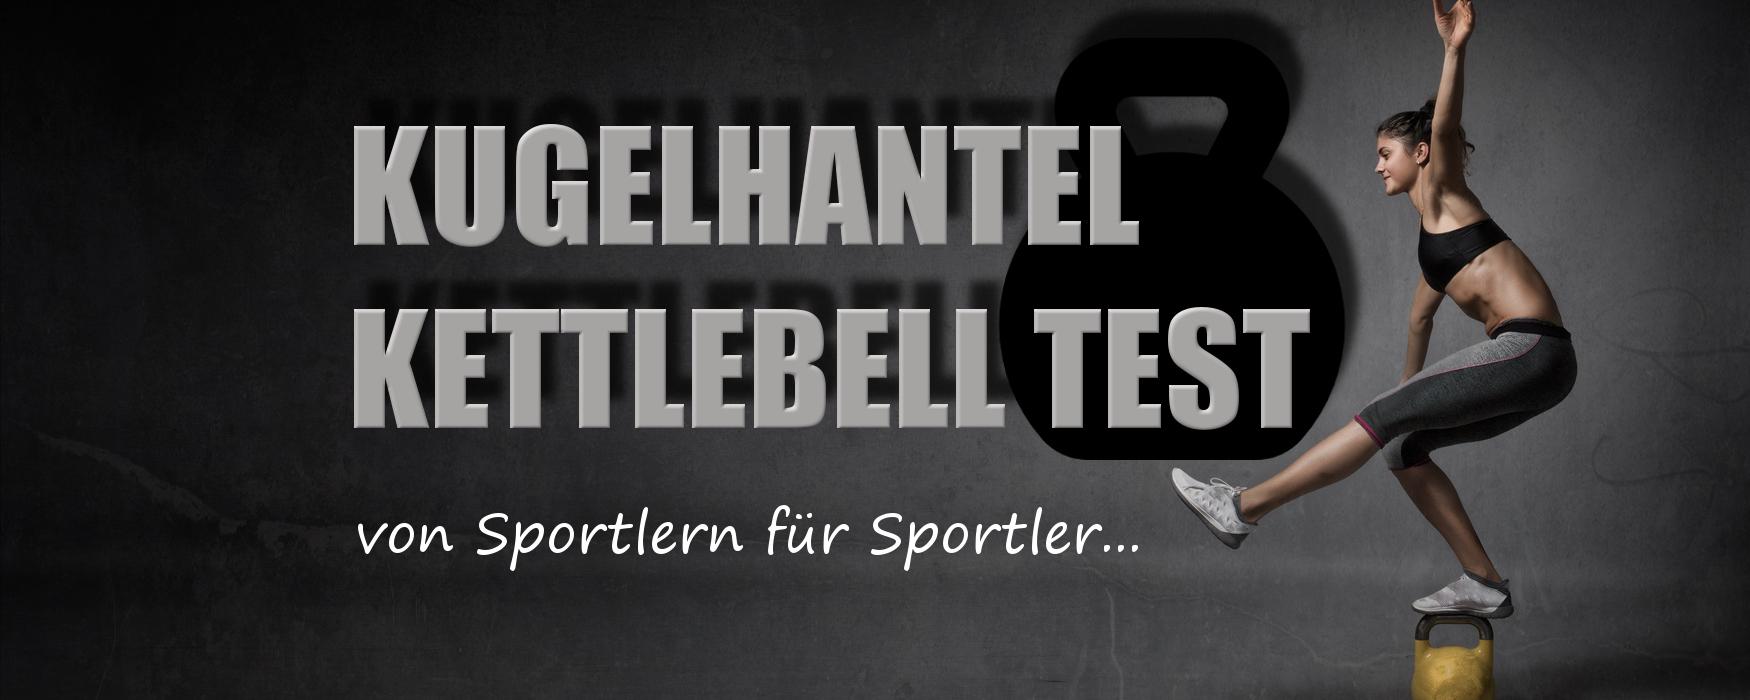 Kettlebell Test